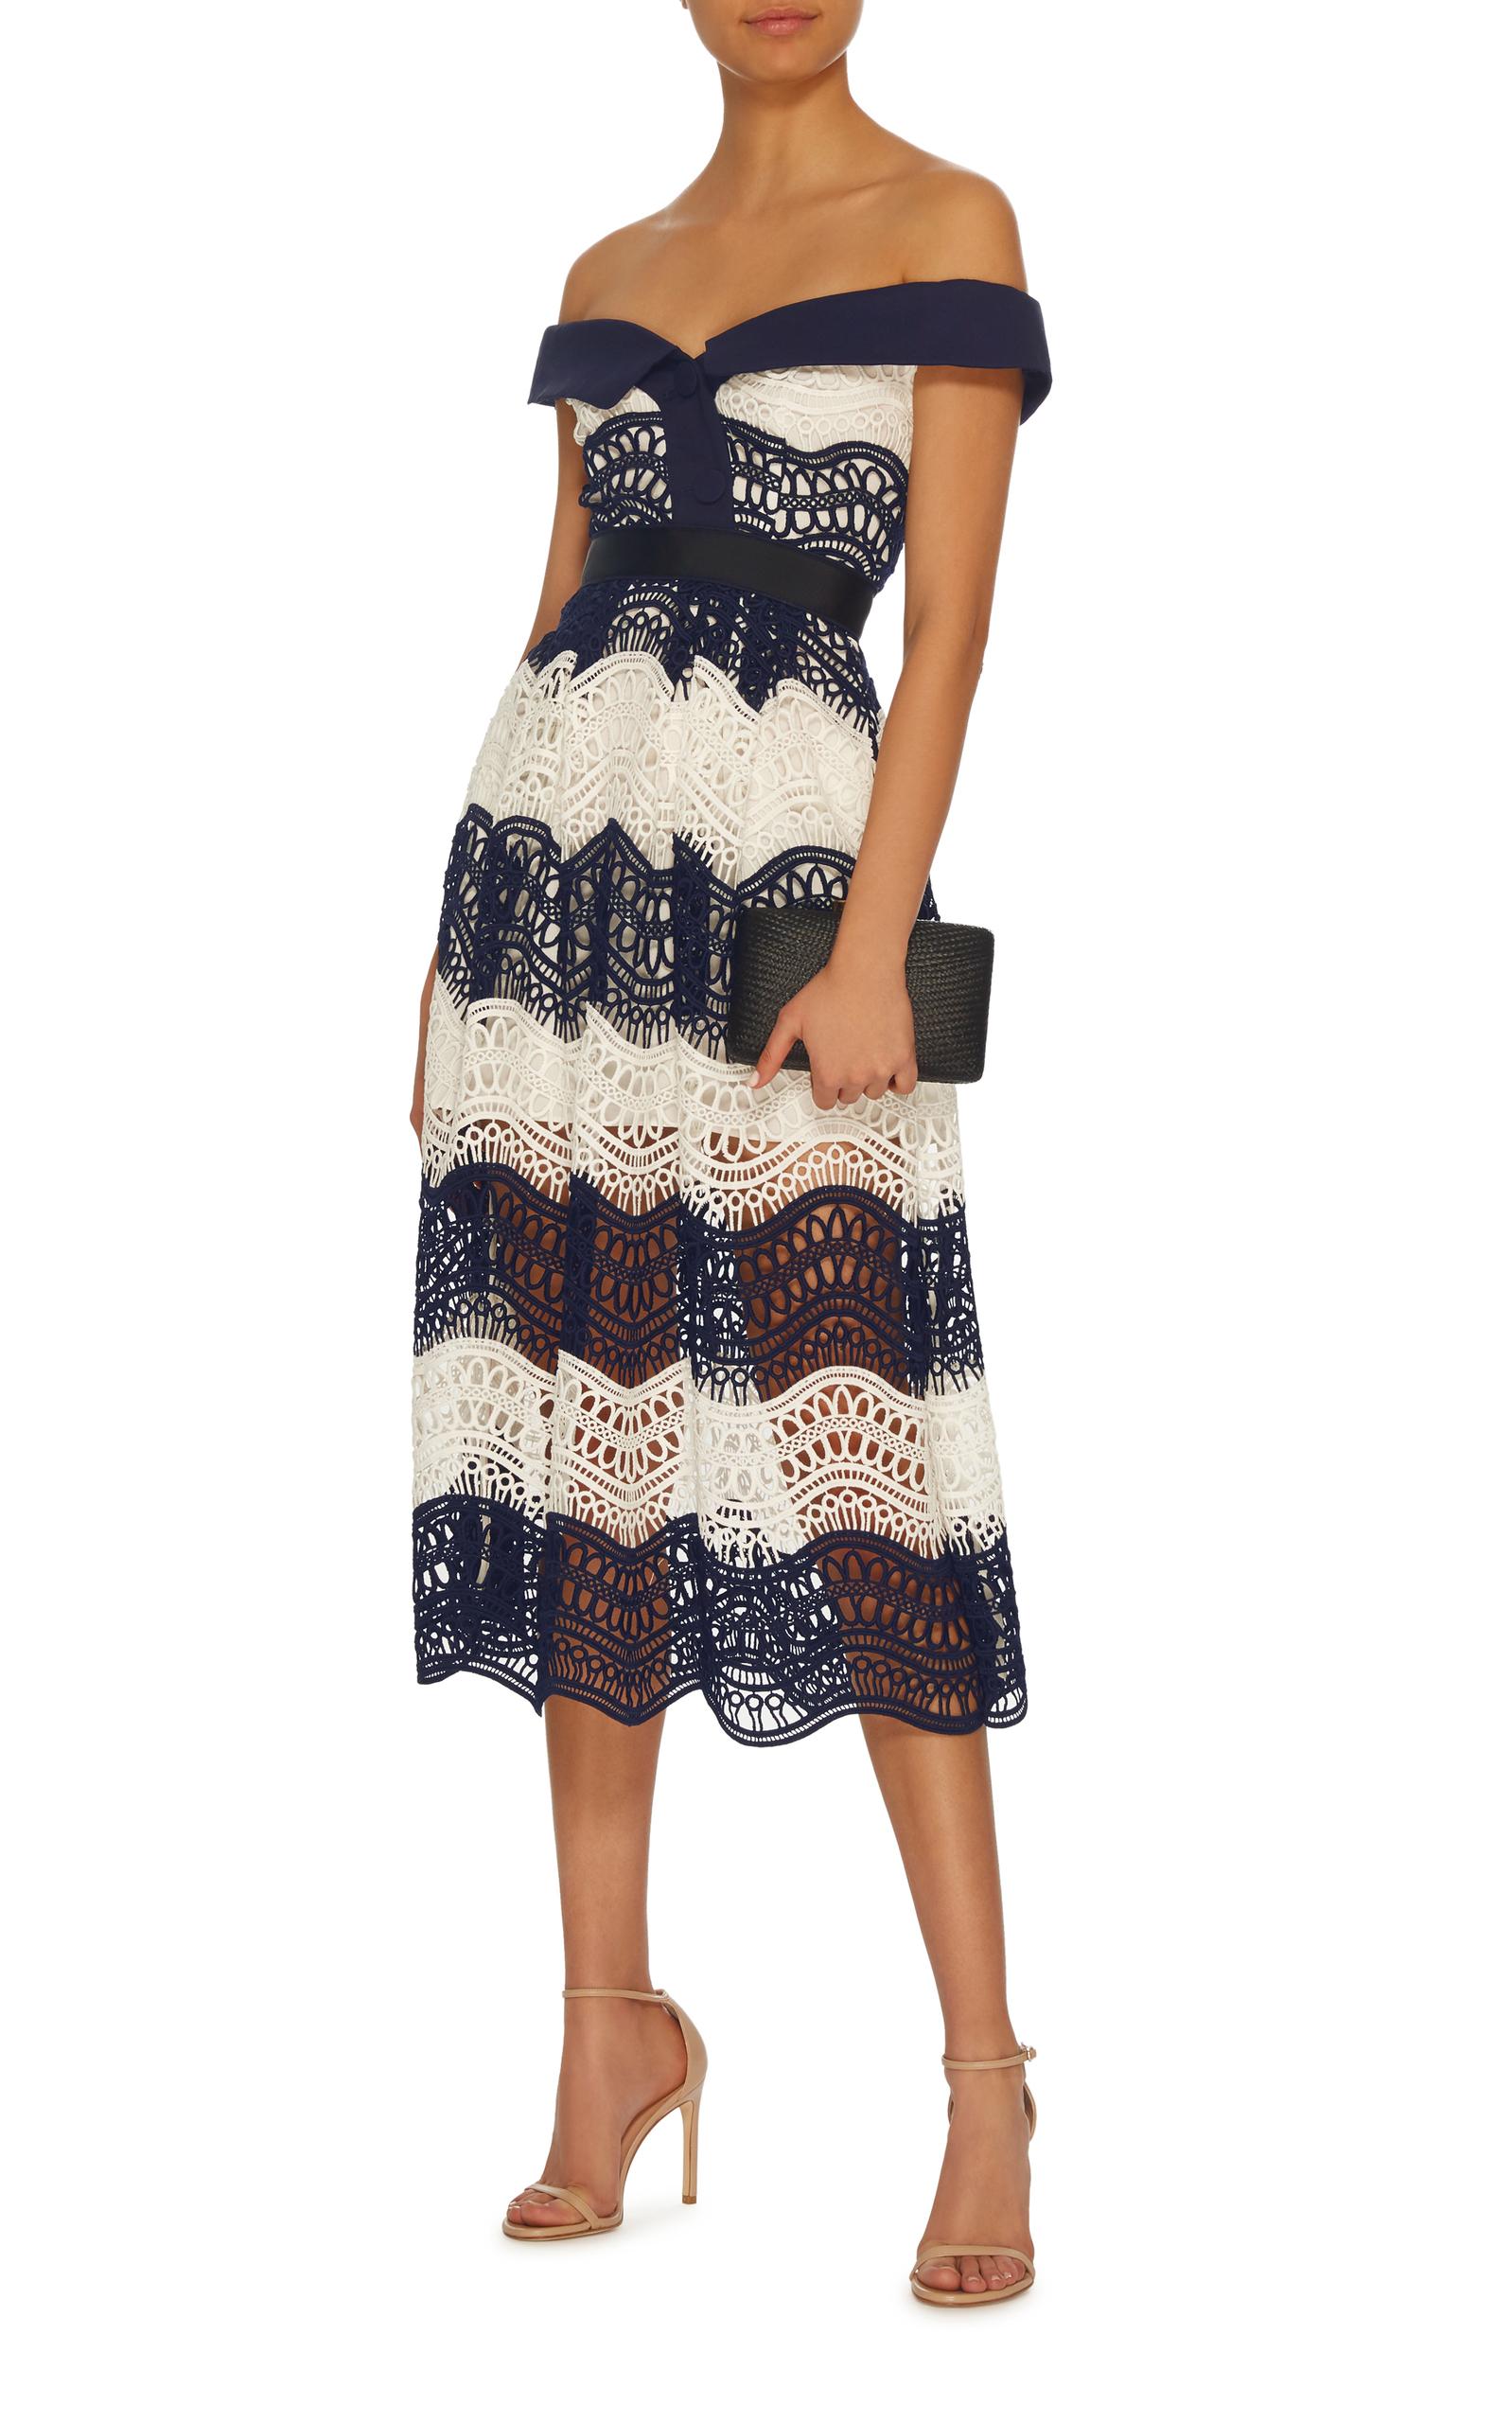 0b579f036a7d3 Self PortraitOff-The-Shoulder Wave Guipure Lace Midi Dress. CLOSE. Loading